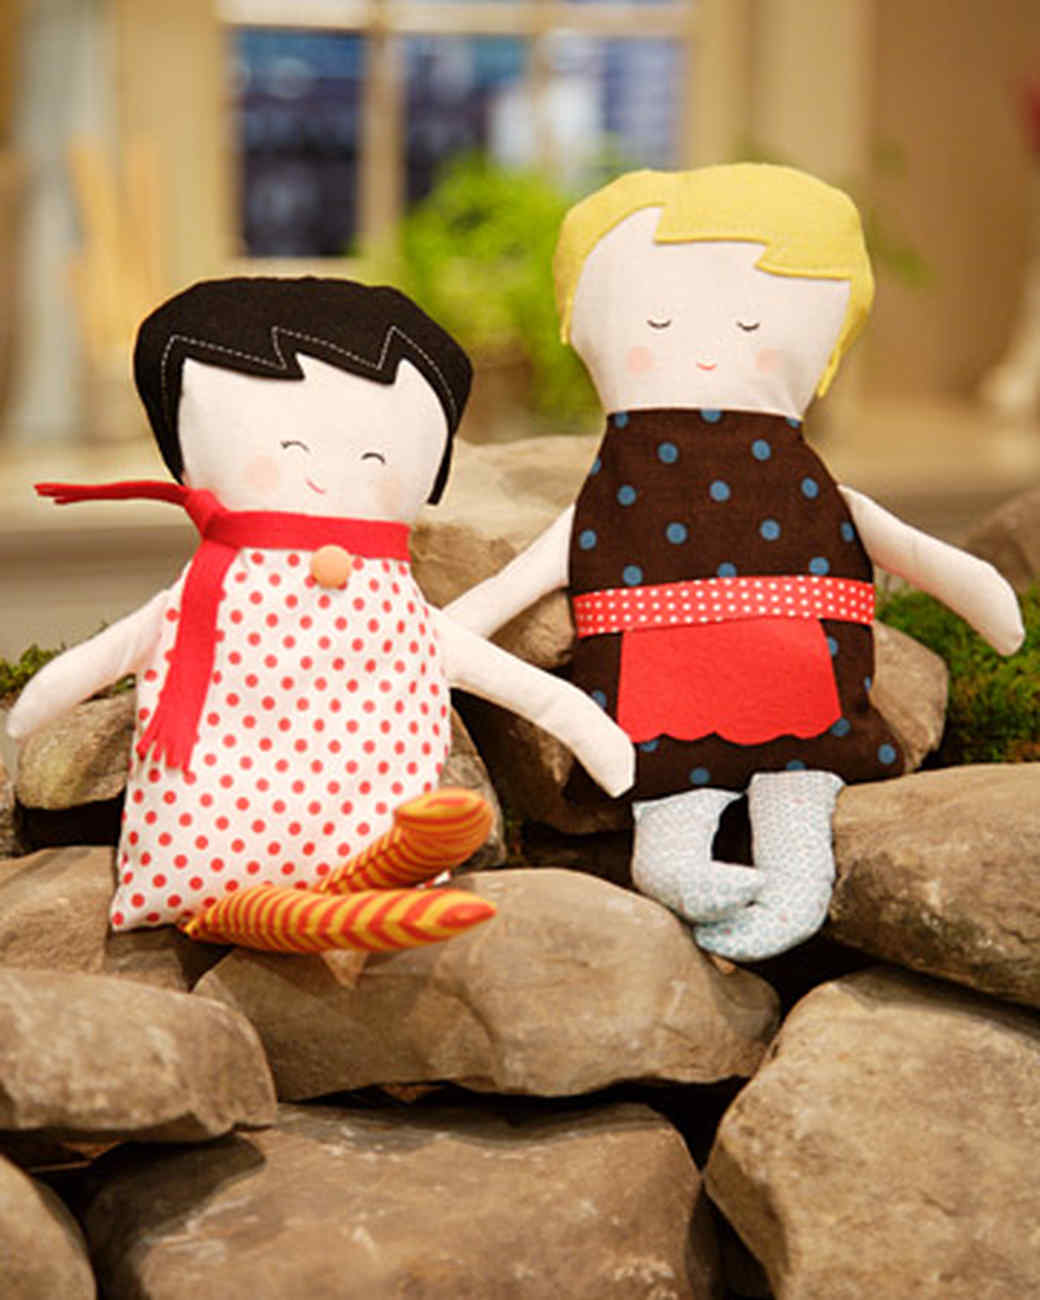 3128_031108_dolls.jpg